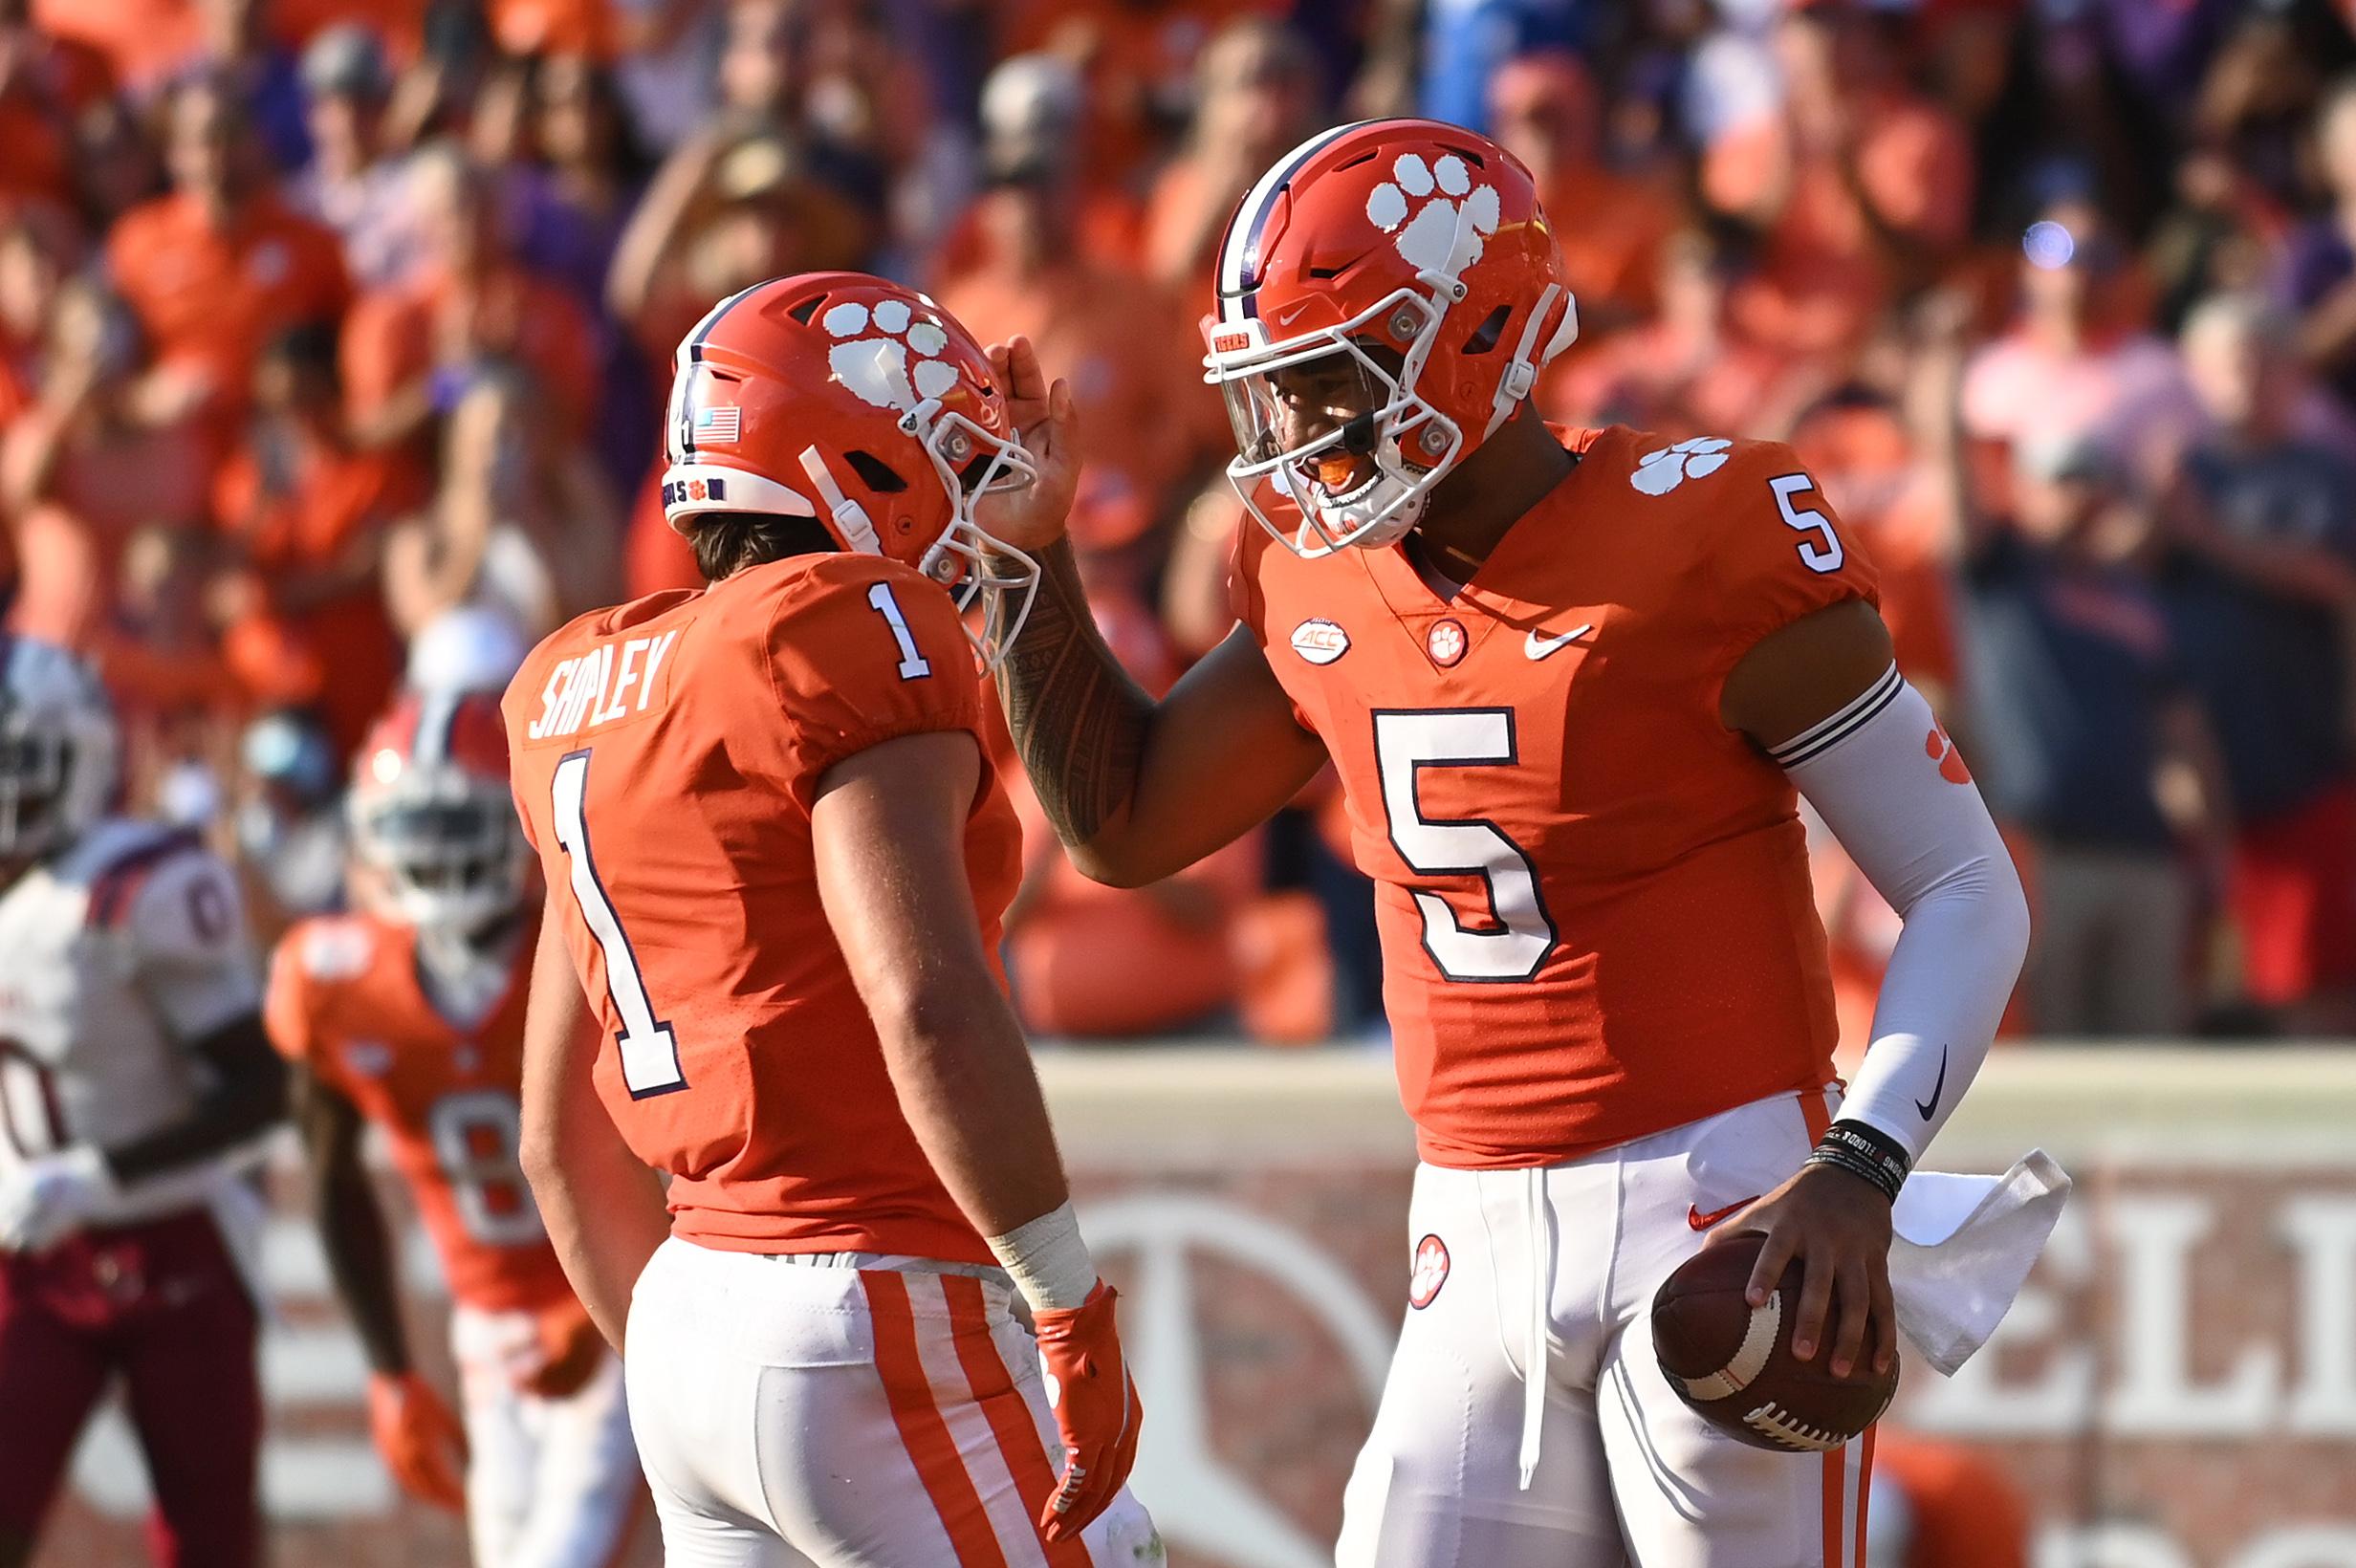 NCAA Football: South Carolina State at Clemson